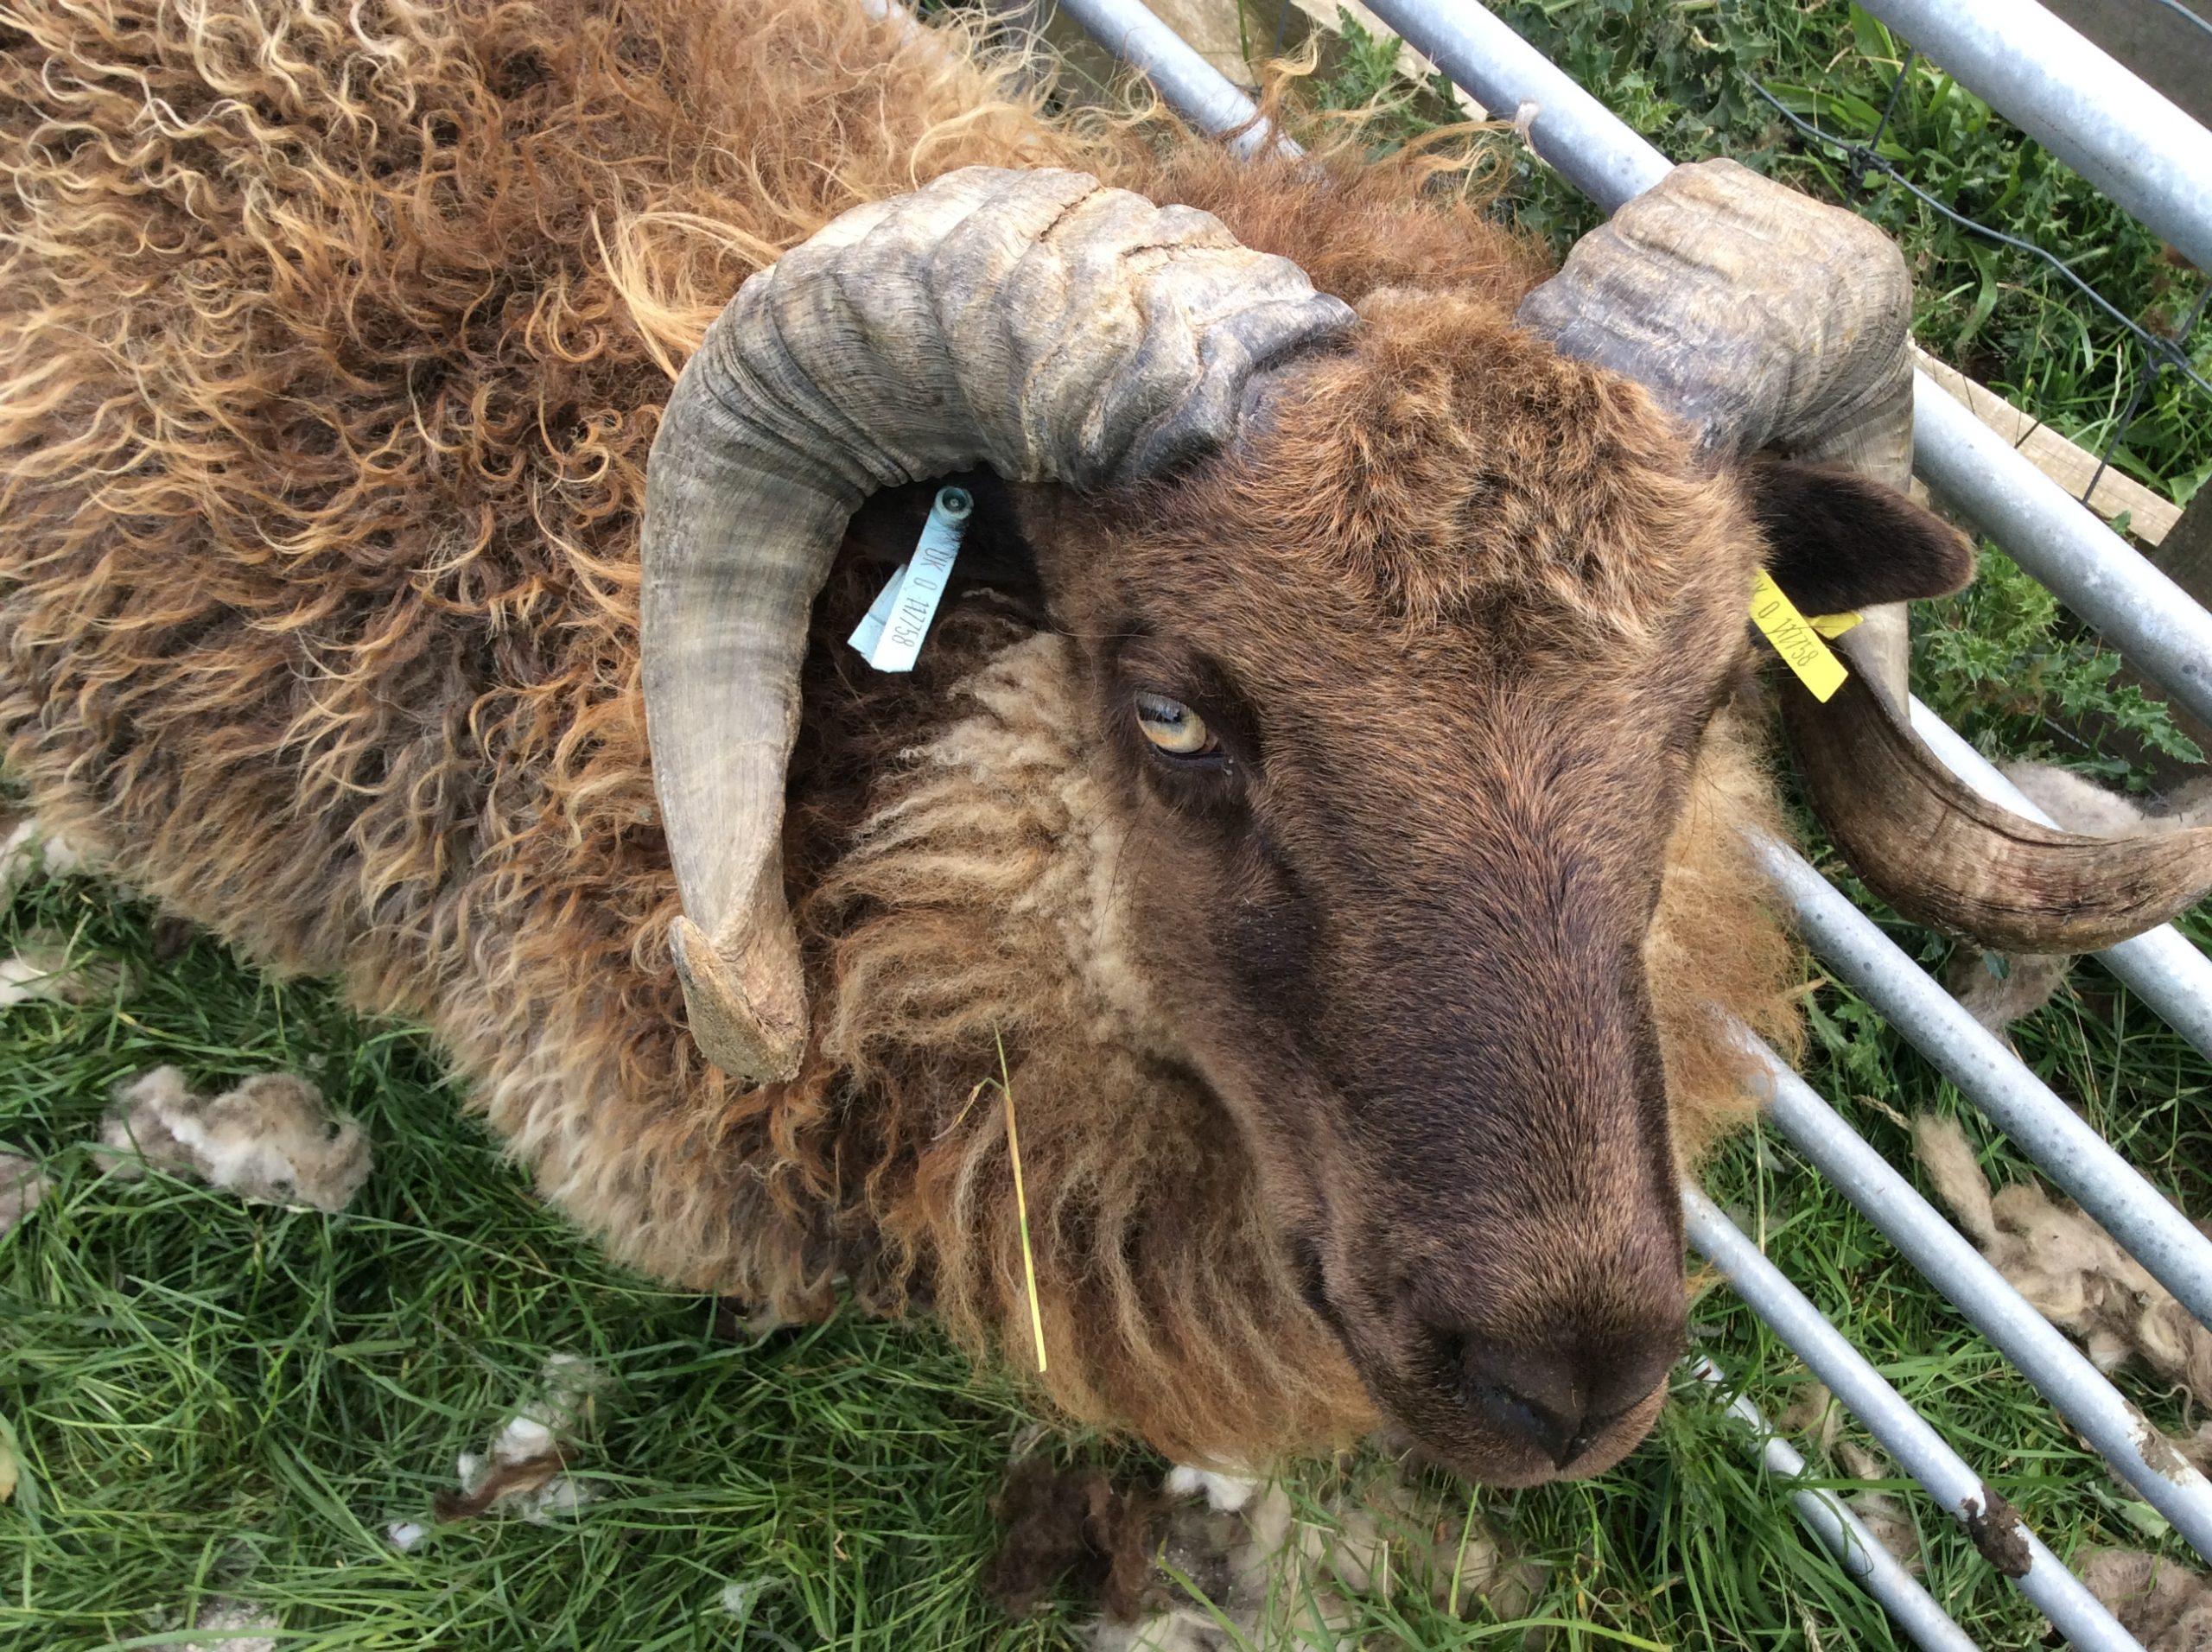 Muggleswick Ram 1 - pic 2